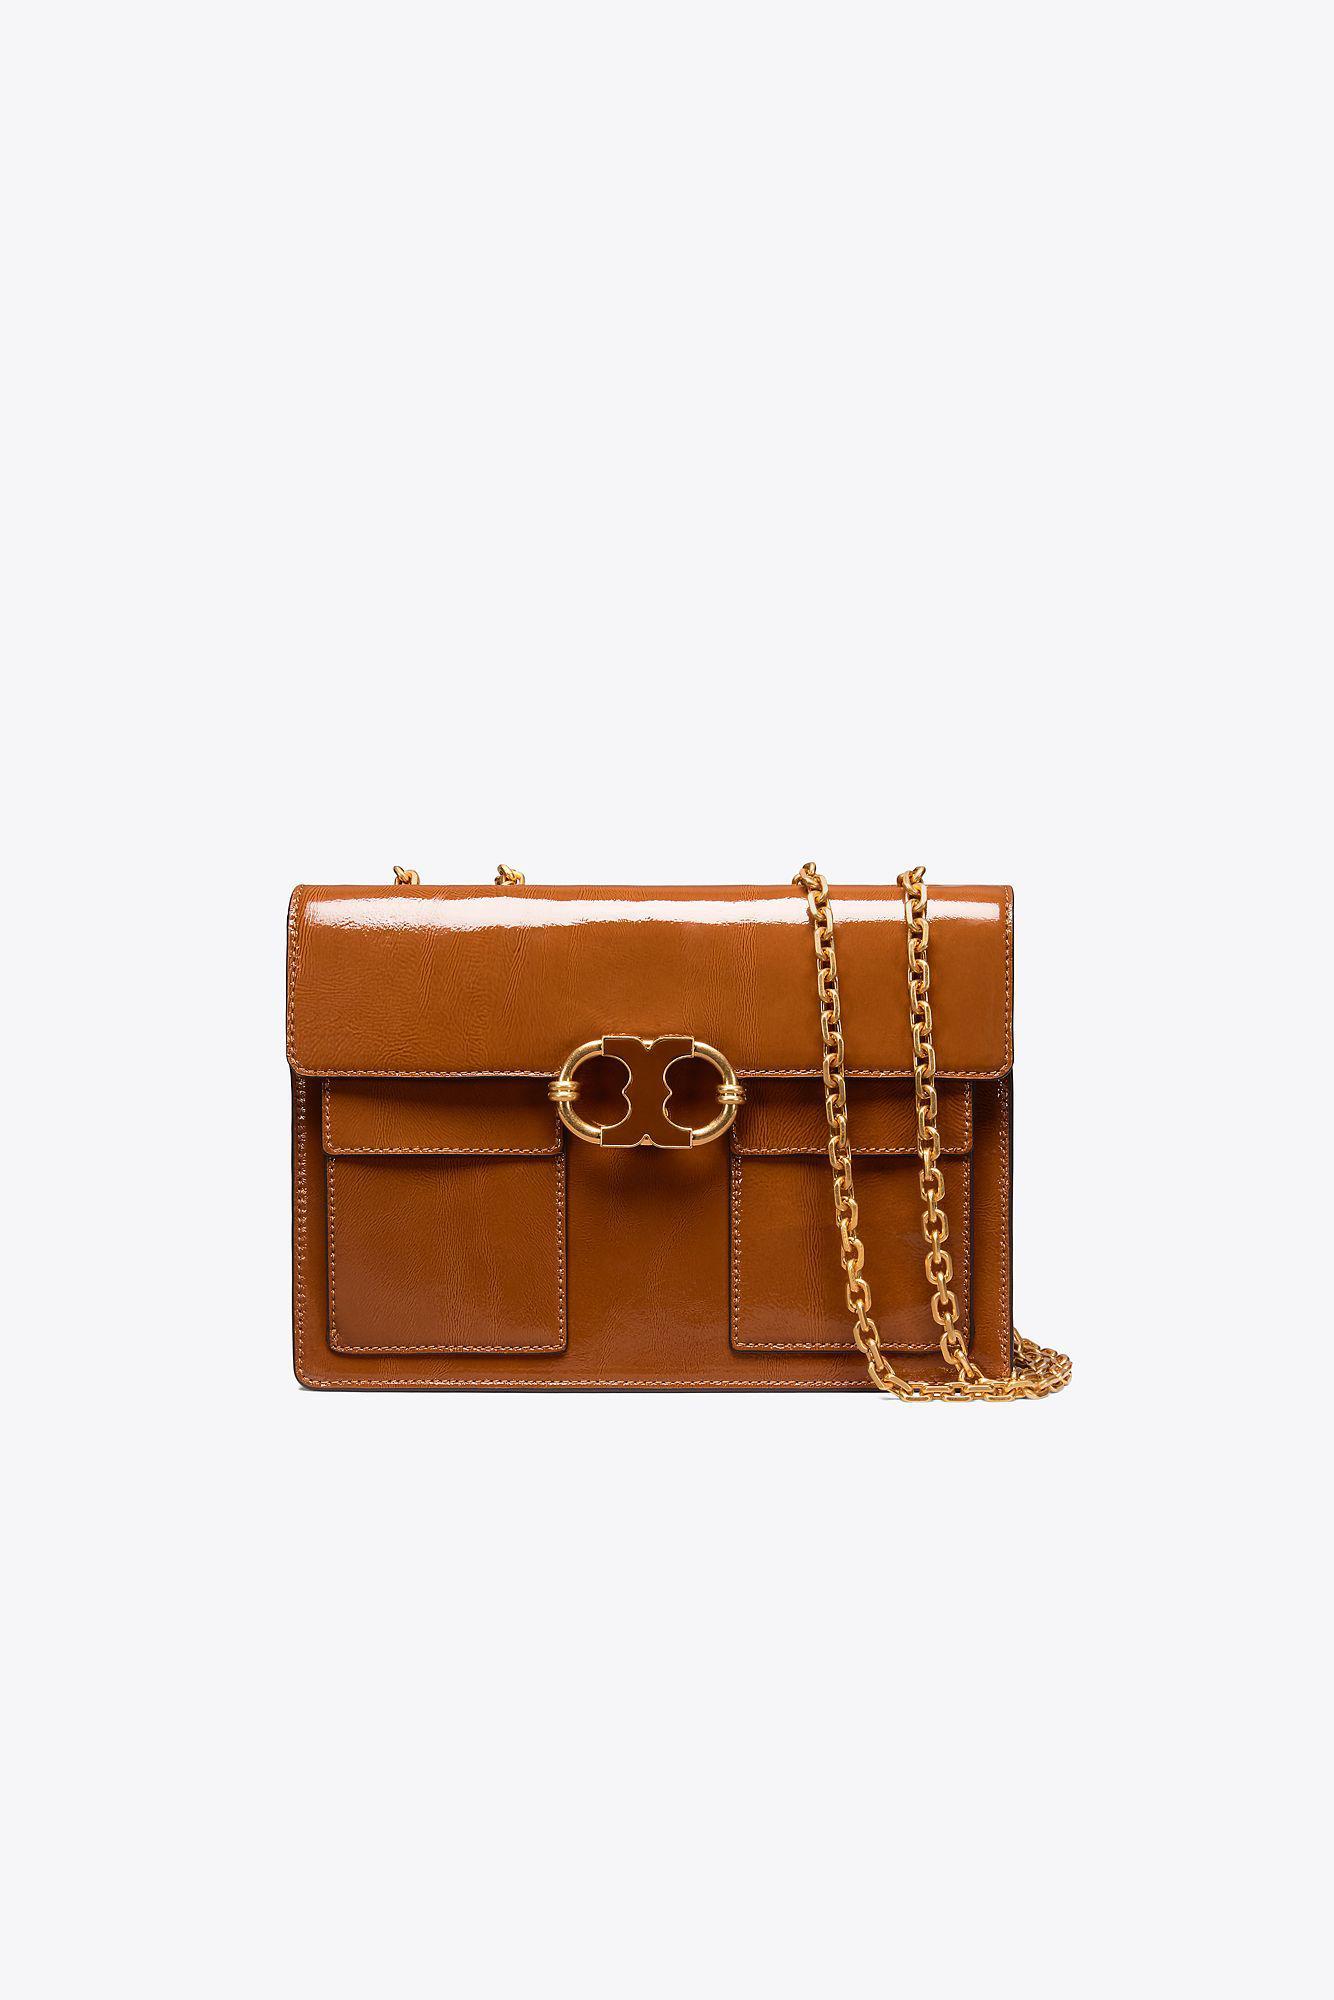 d5c8ecb9c97 Tory Burch Gemini Link Patent Medium Chain Shoulder Bag in Brown - Lyst